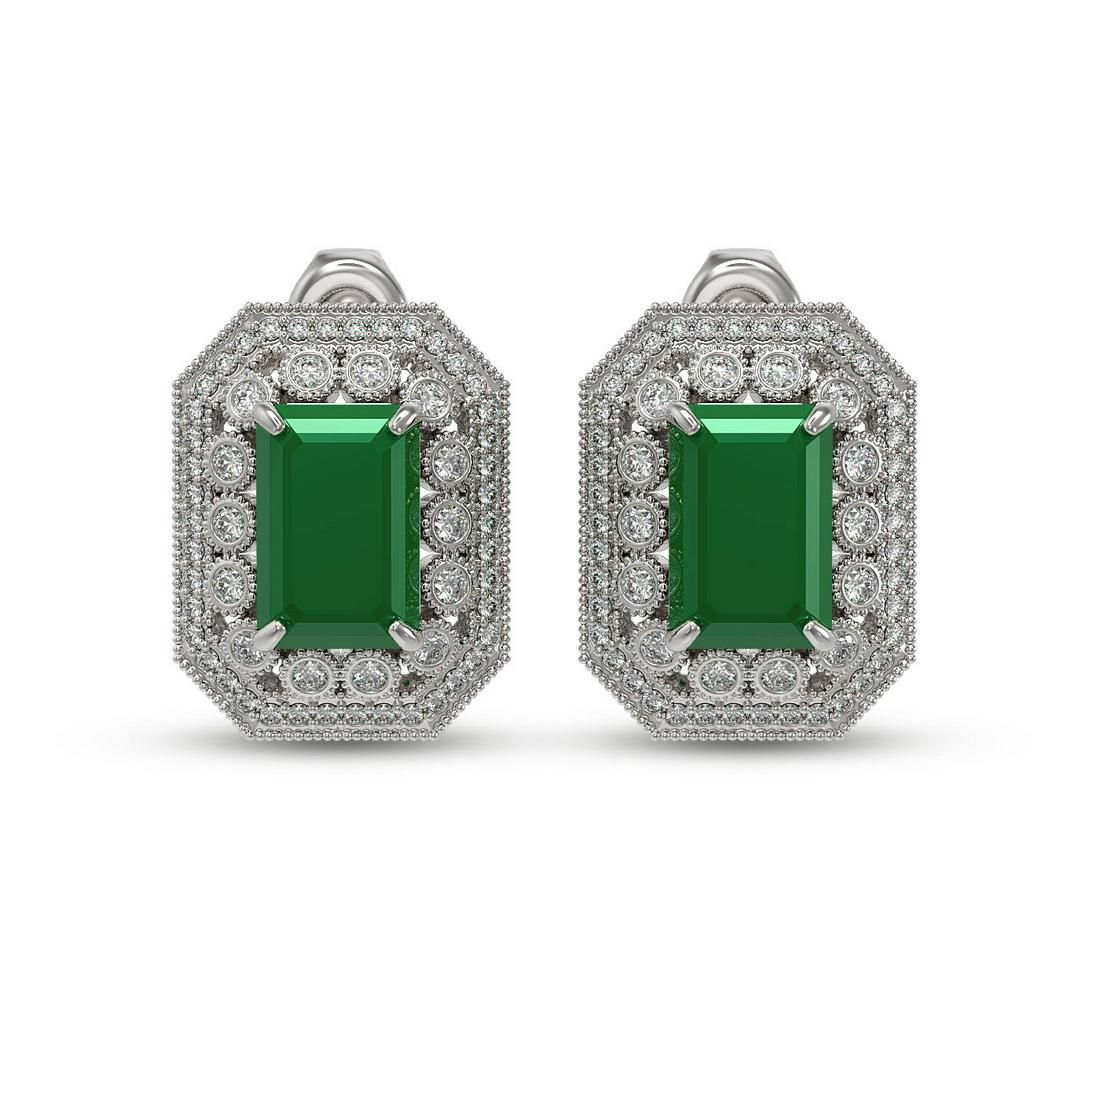 13.75 ctw Certified Emerald & Diamond Victorian